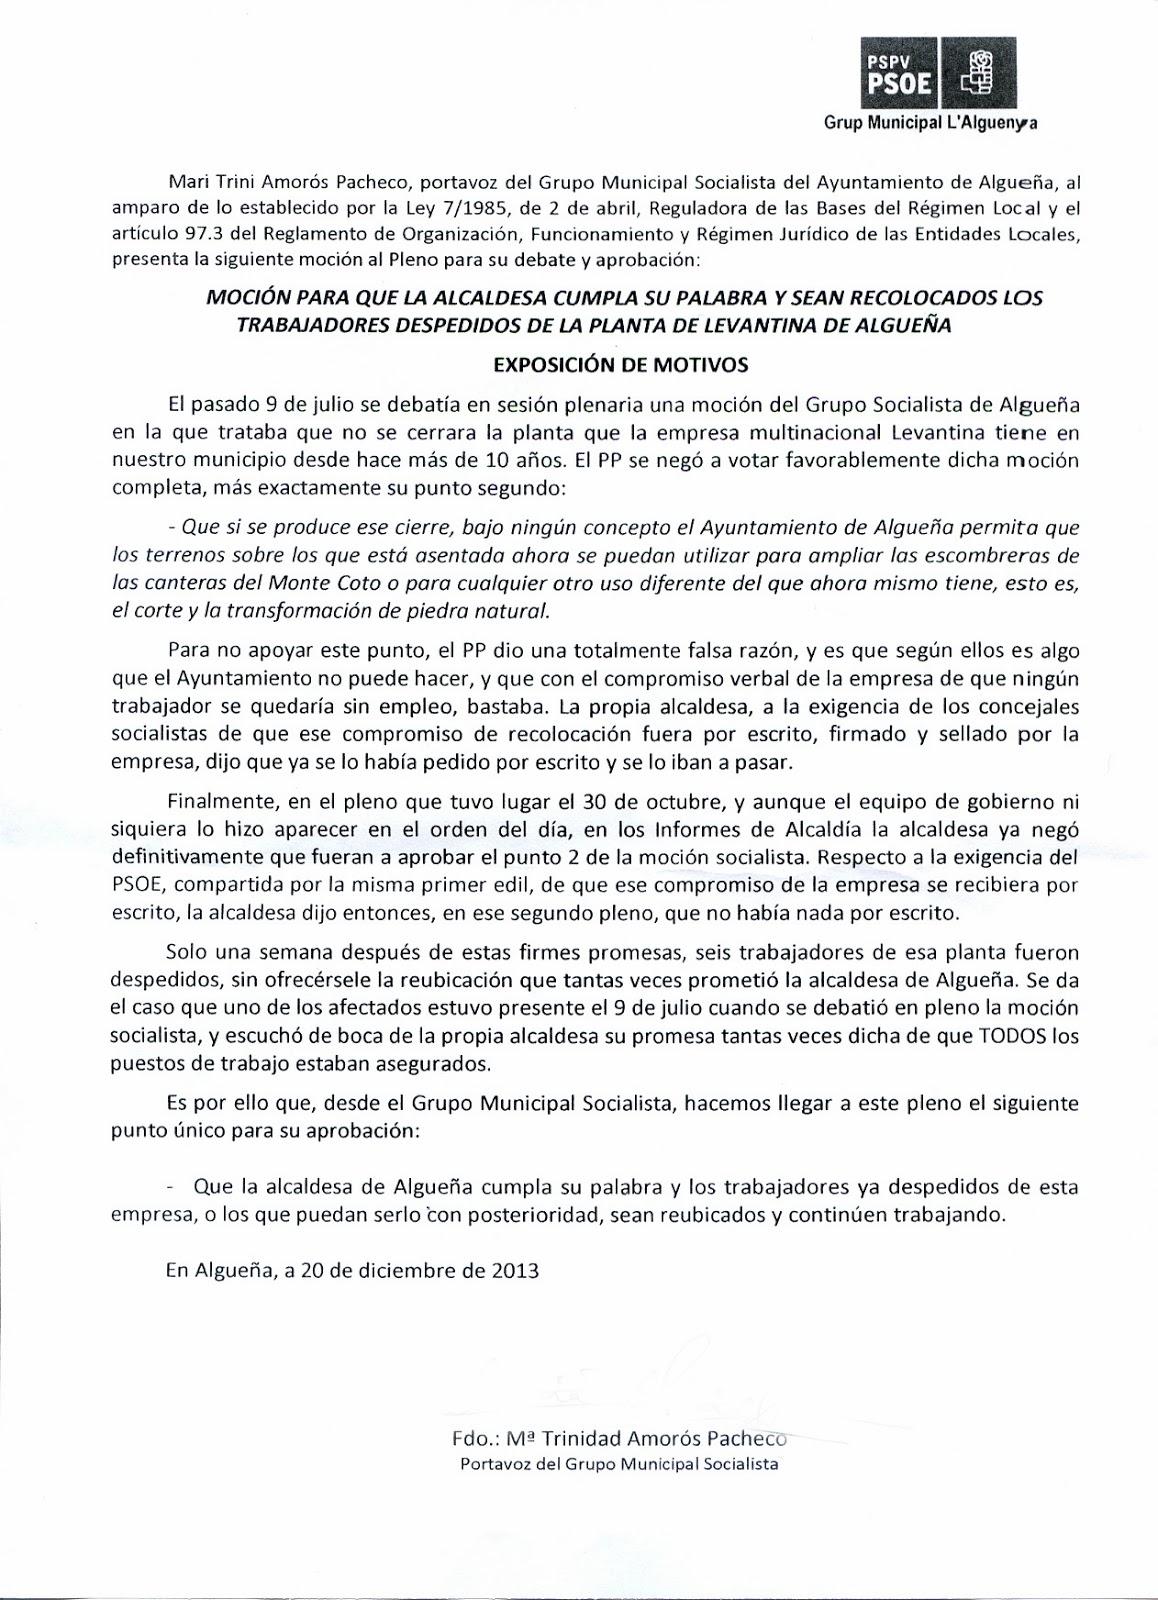 Pspv psoe algue a enero 2014 - Levantina novelda ...